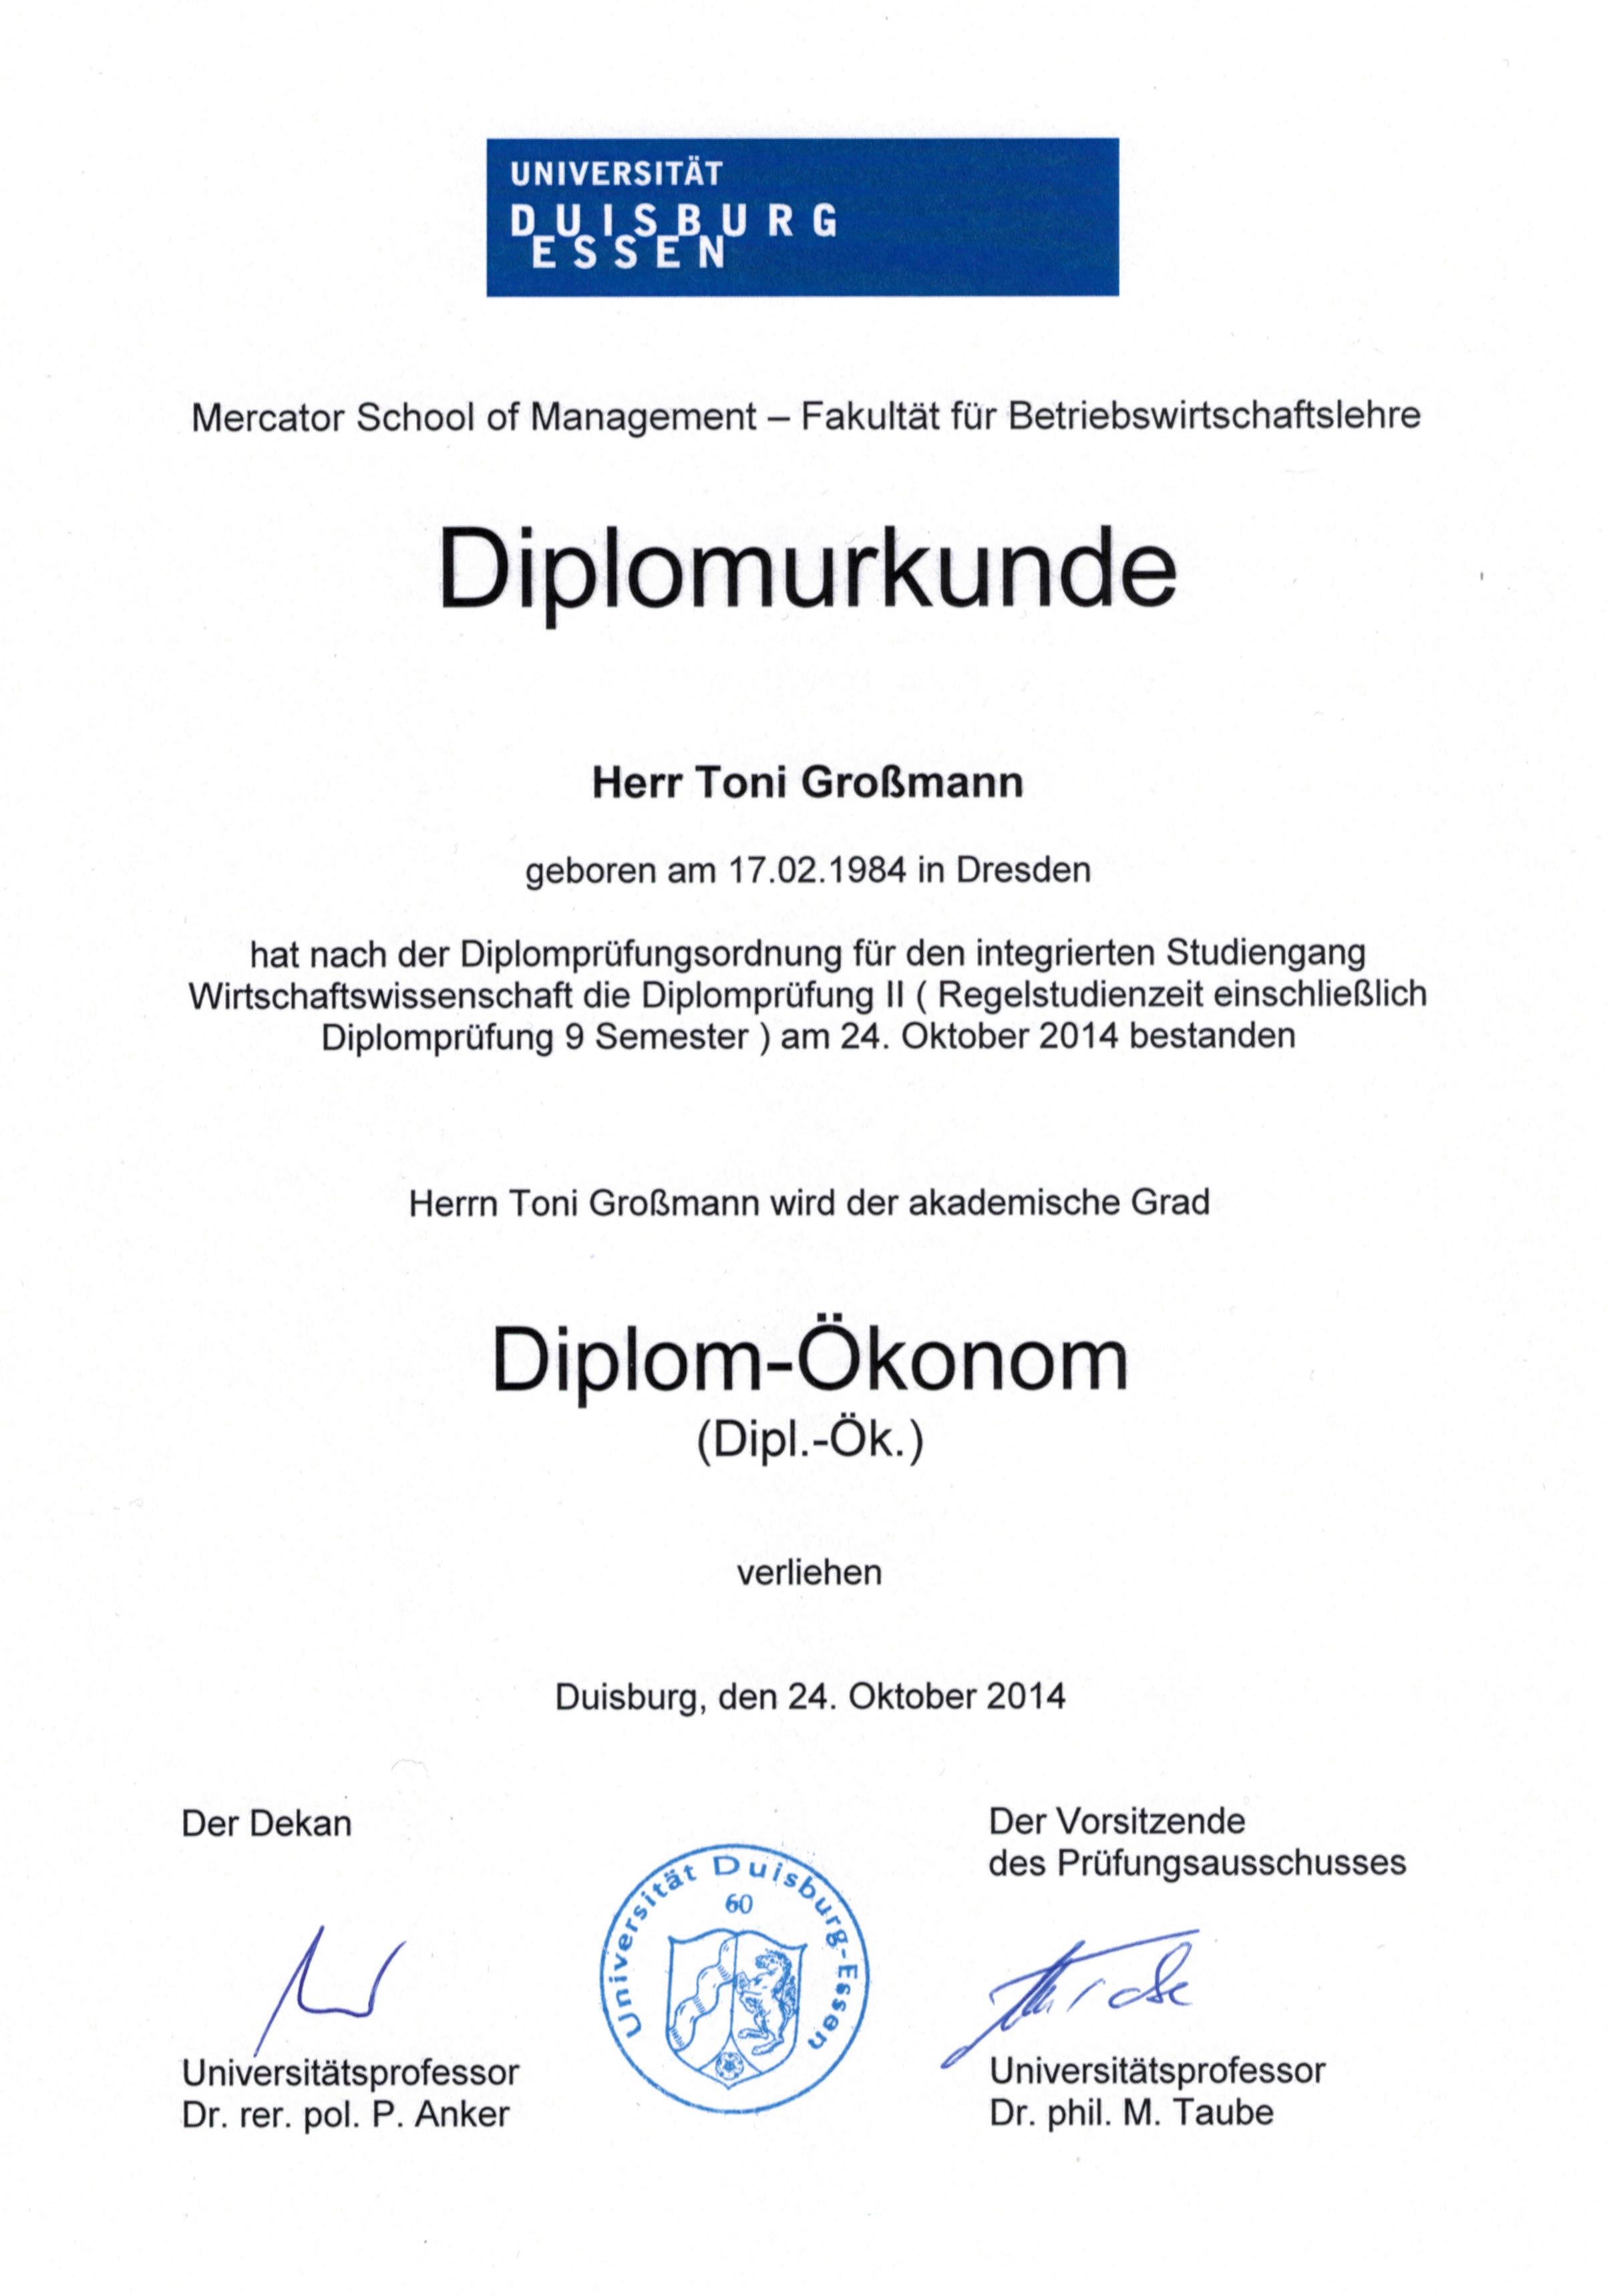 Charmant Lebenslauf Diplom Student Ideen - Beispiel Business ...